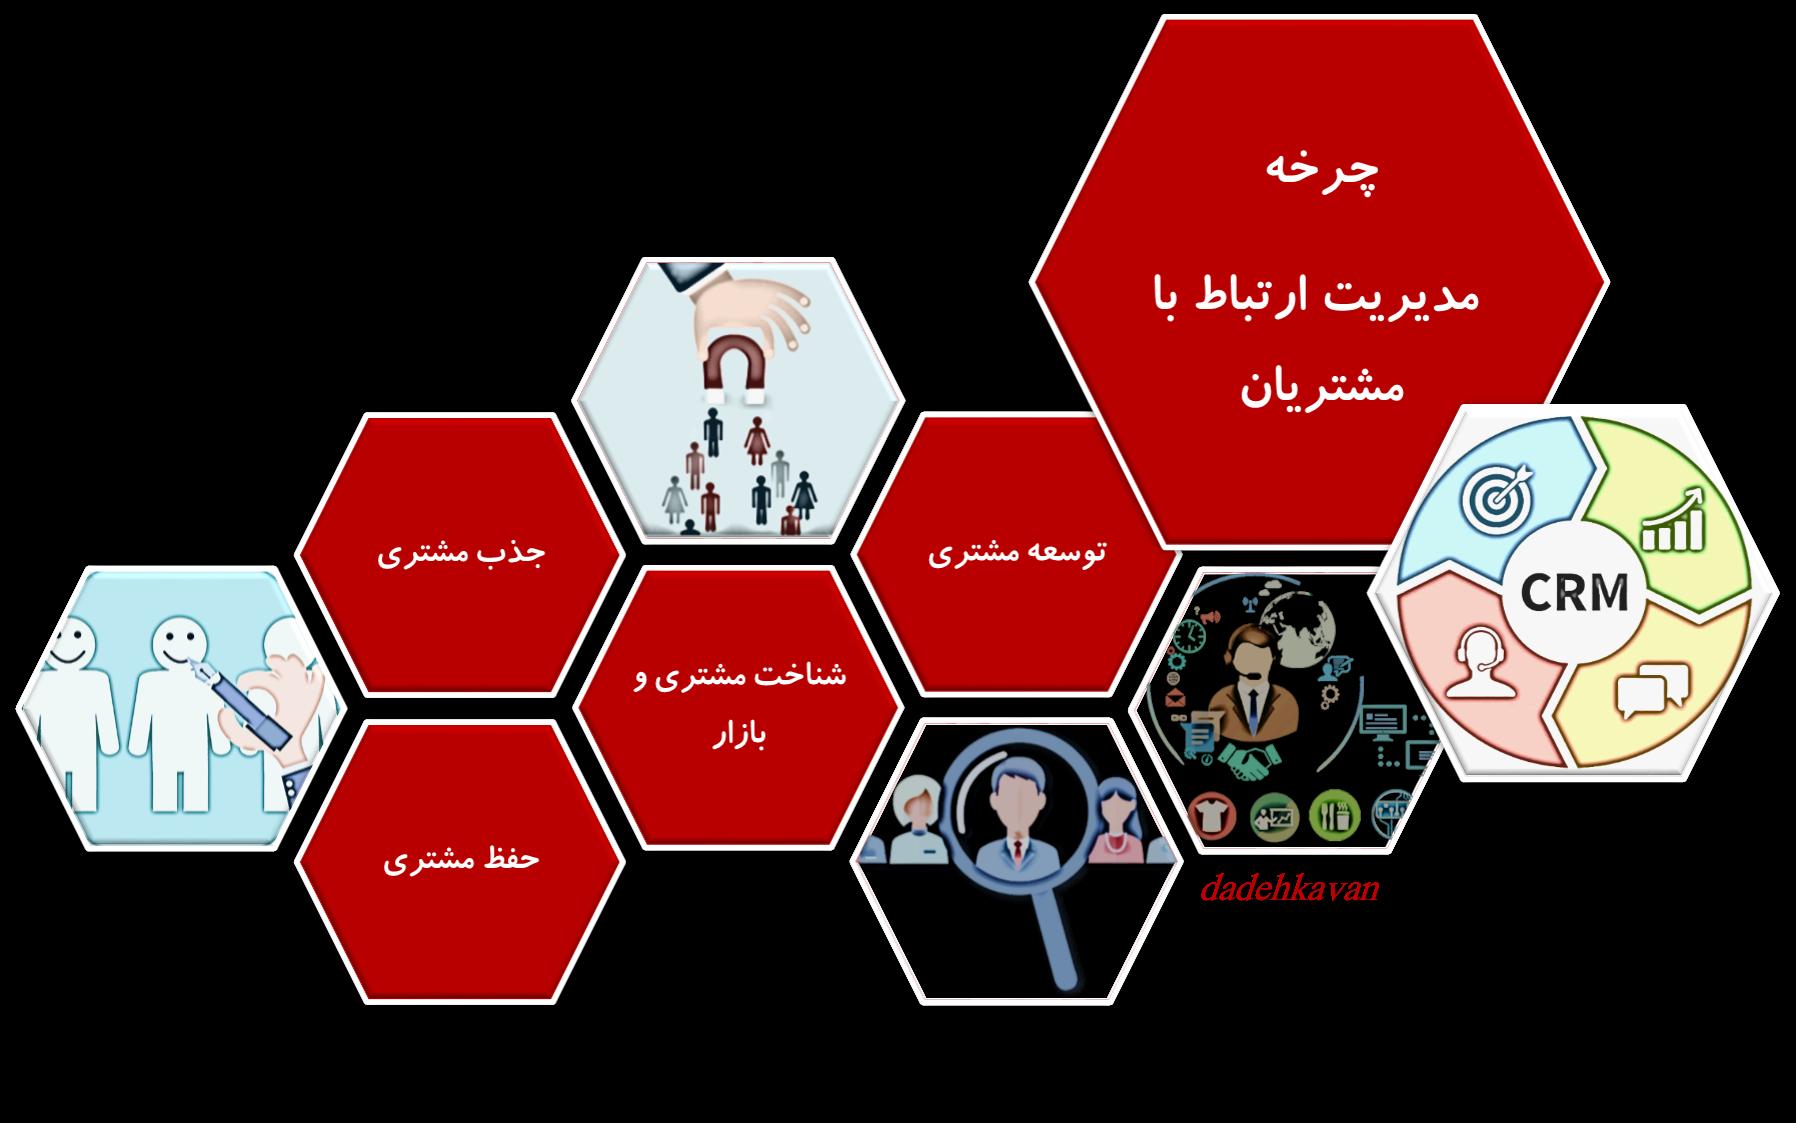 CRM_dadehkavan- چرخه مدیریت ارتباط با مشتری